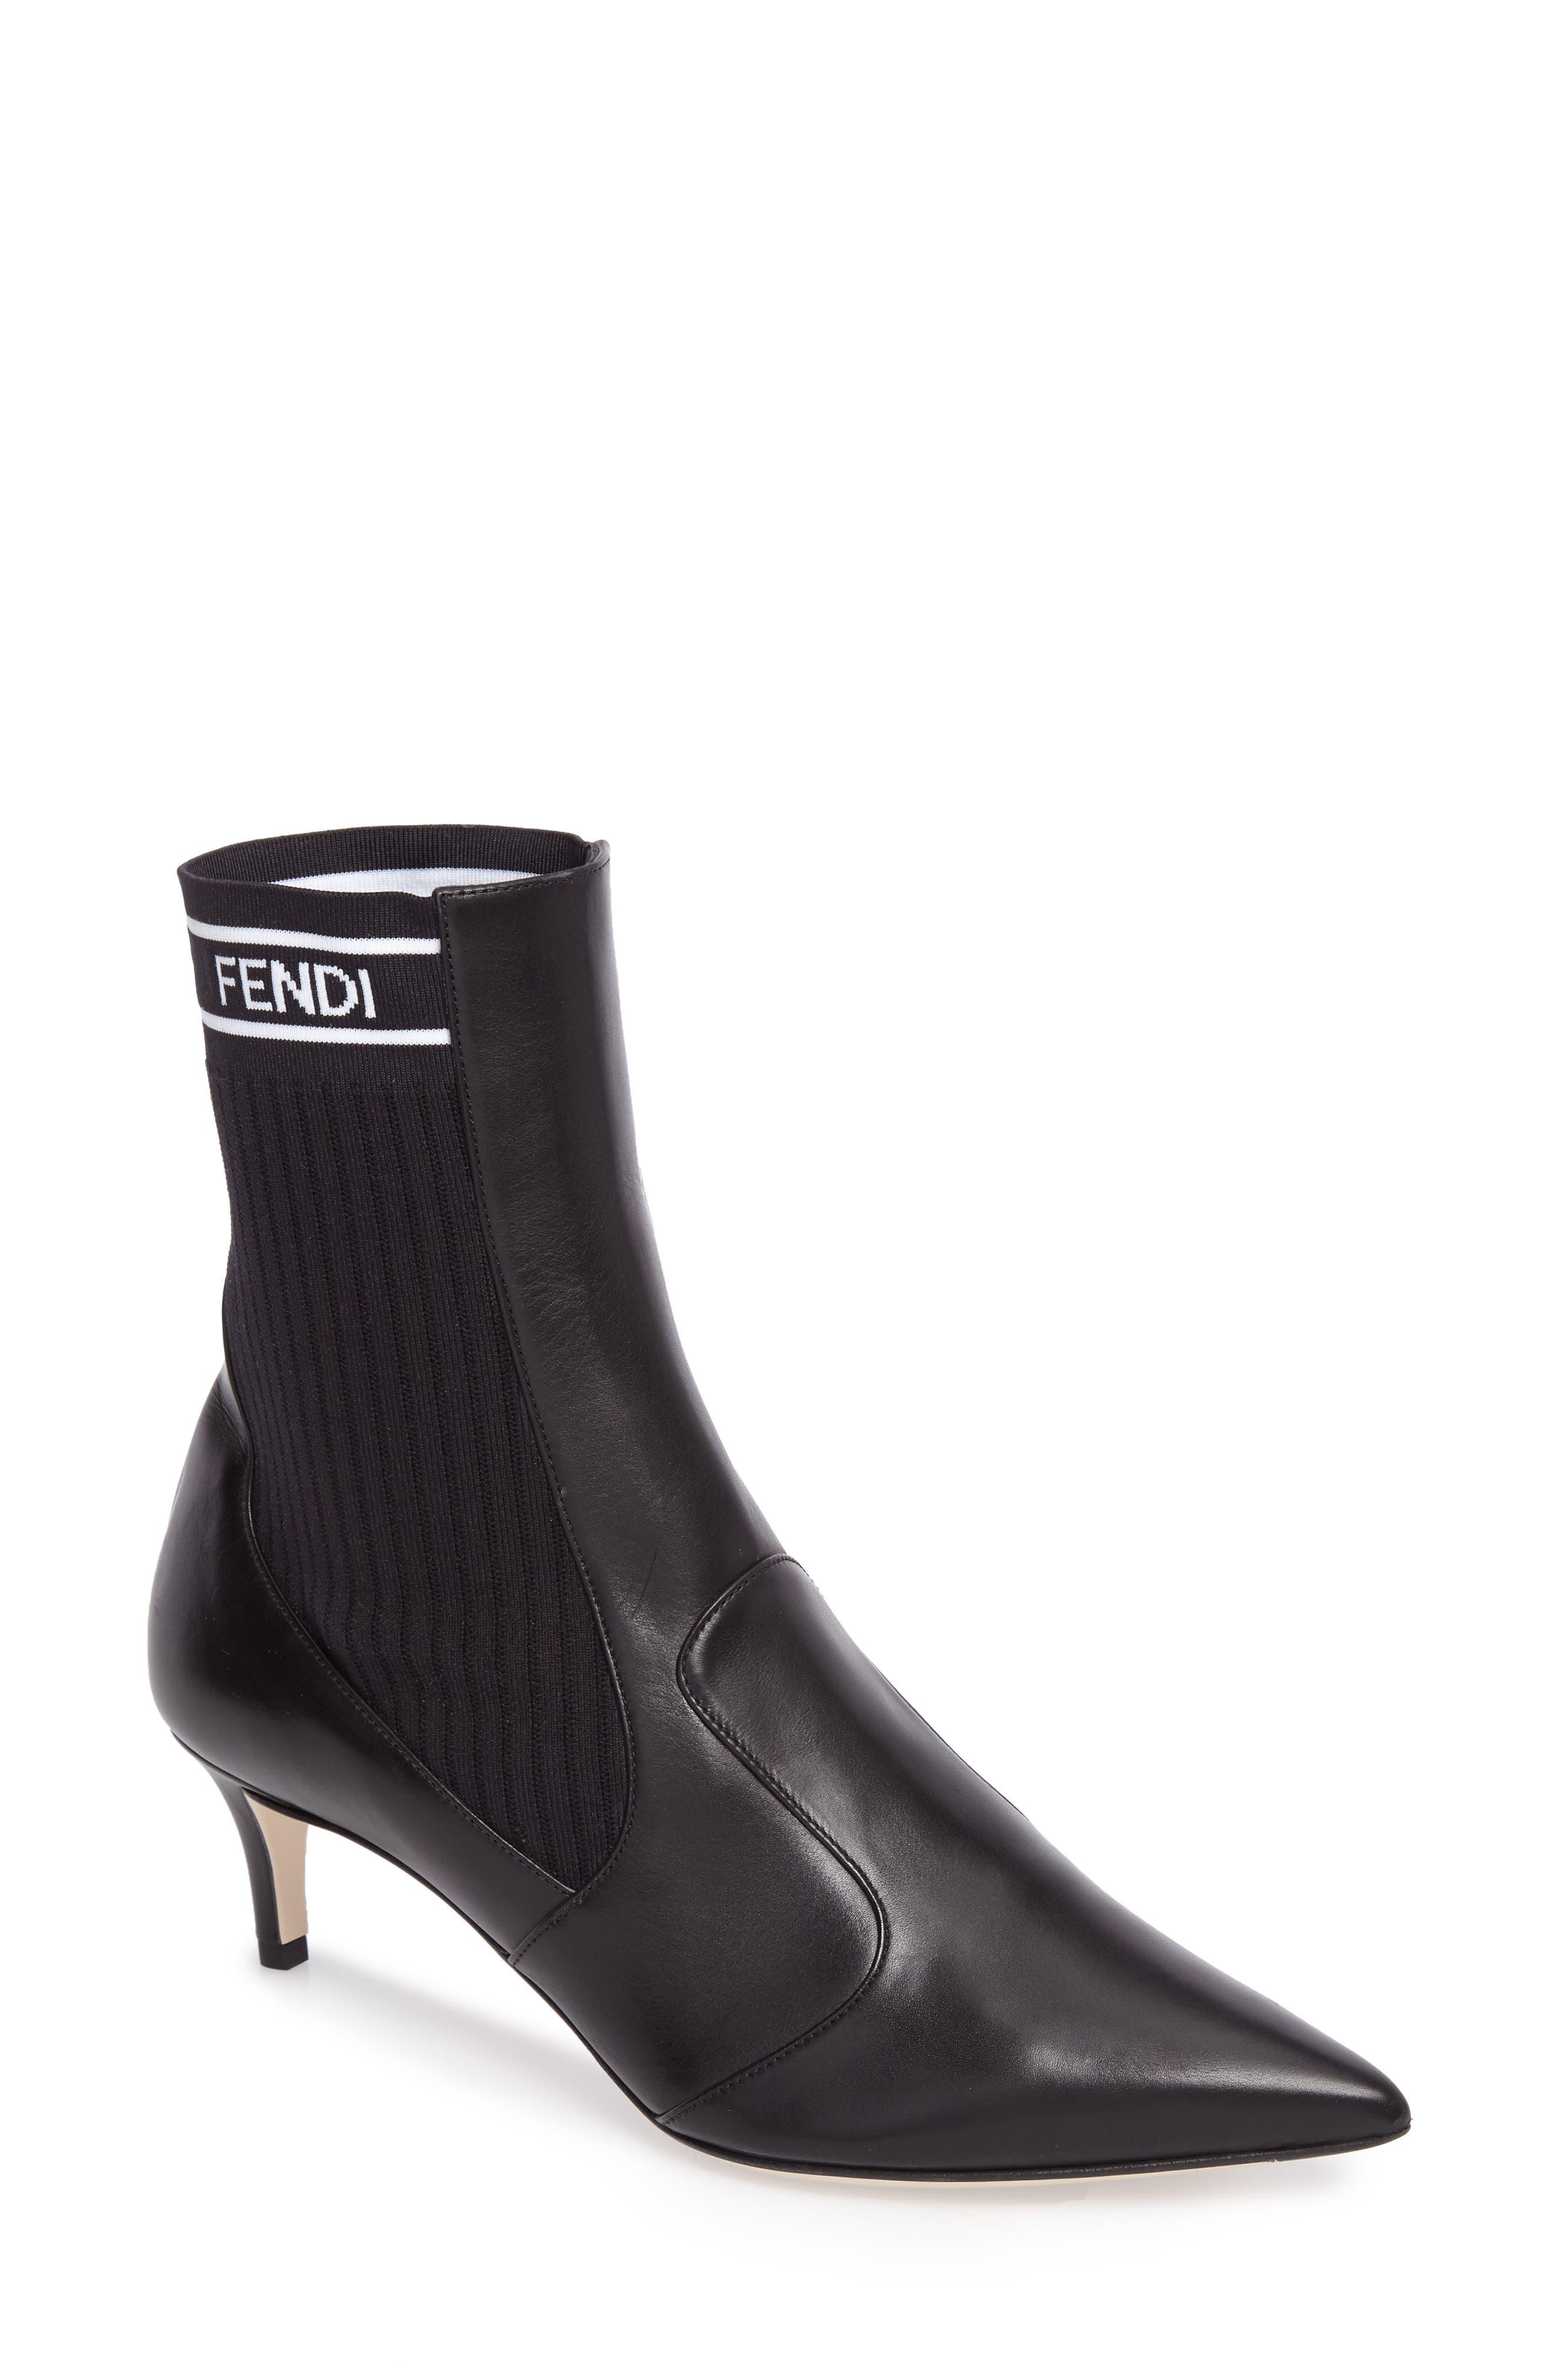 Alternate Image 1 Selected - Fendi Rockoko Chelsea Sock Boot (Women)